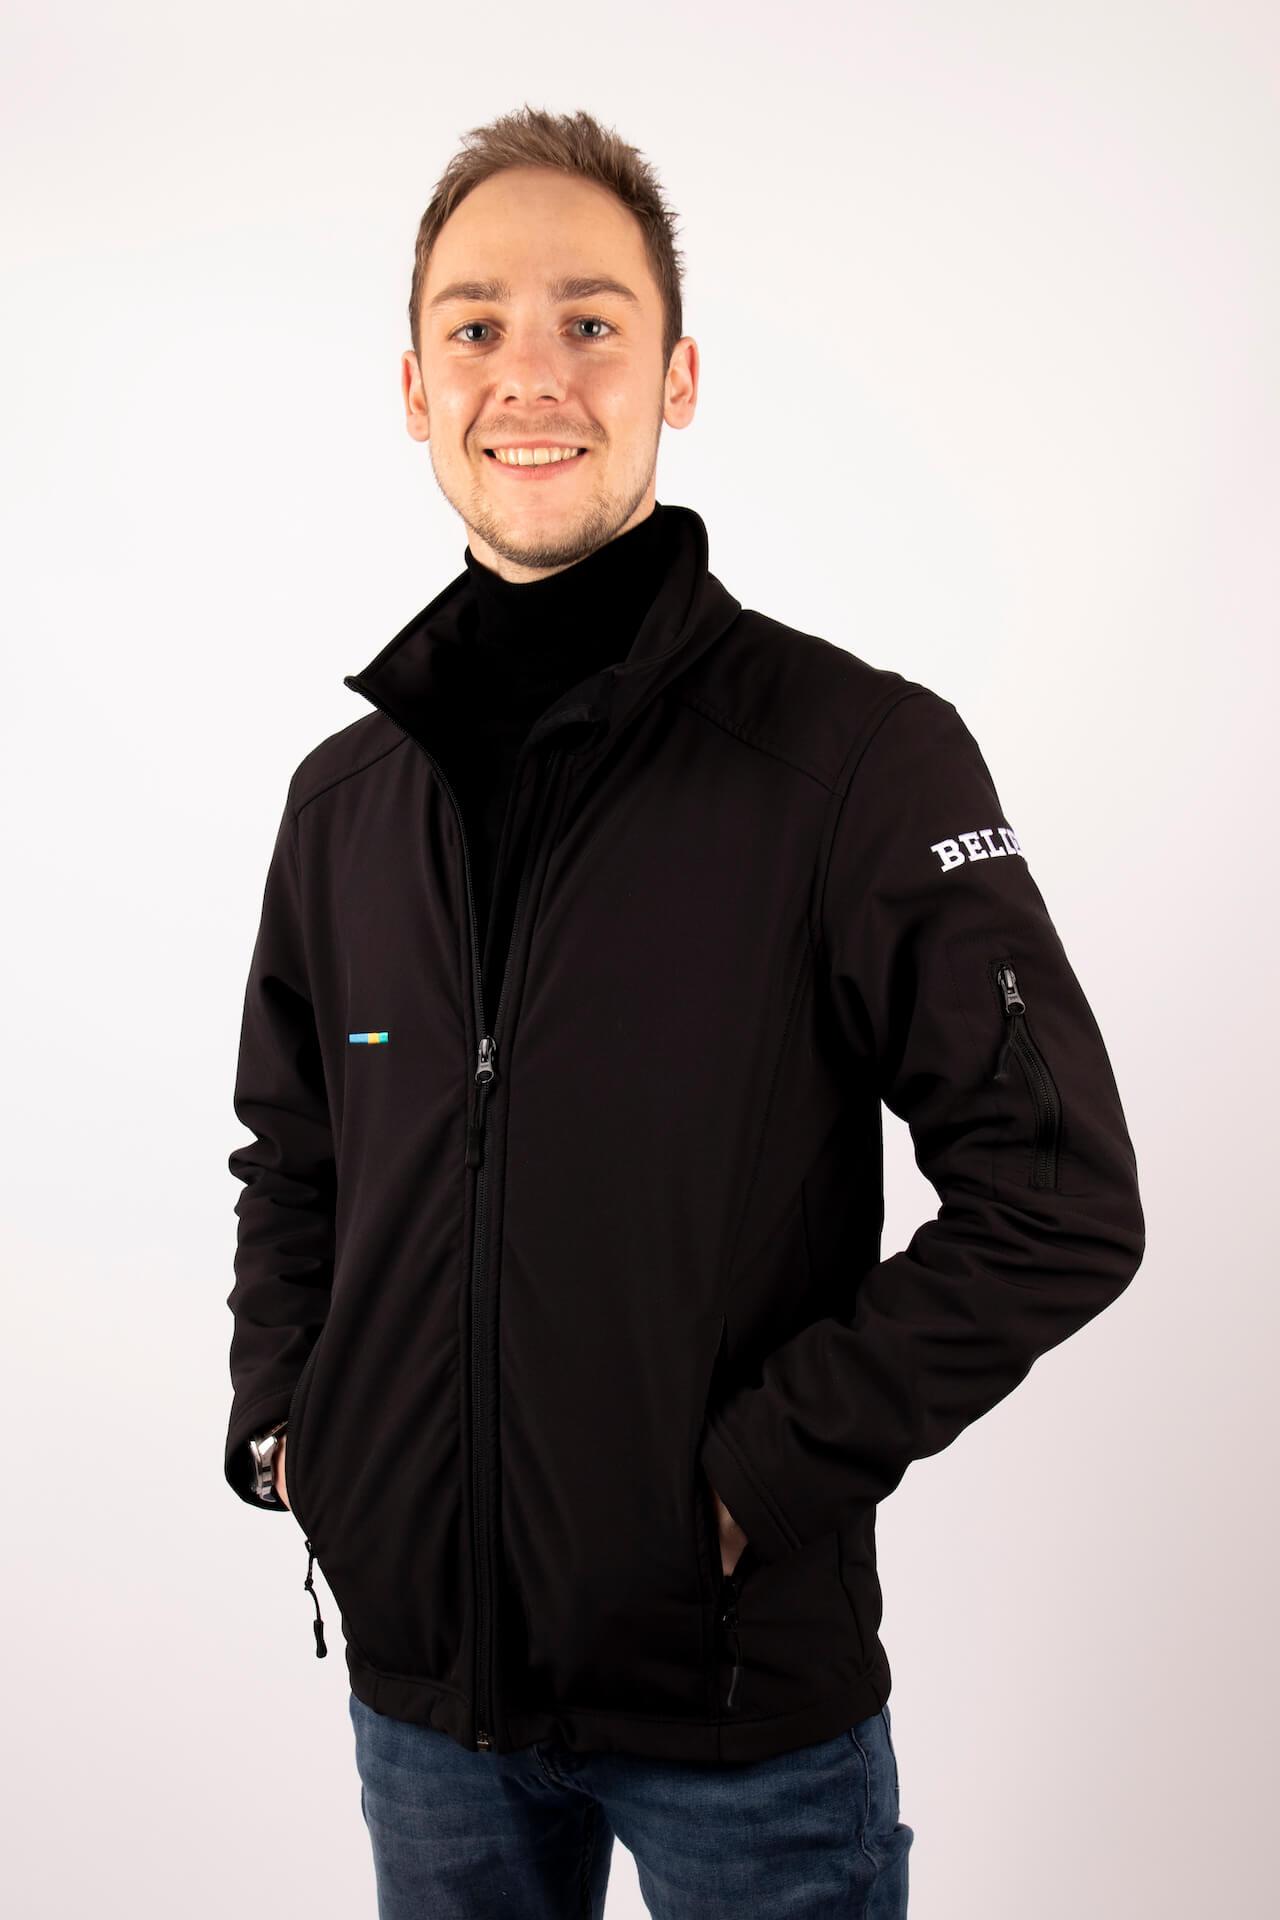 Softshell jacket - Belieff